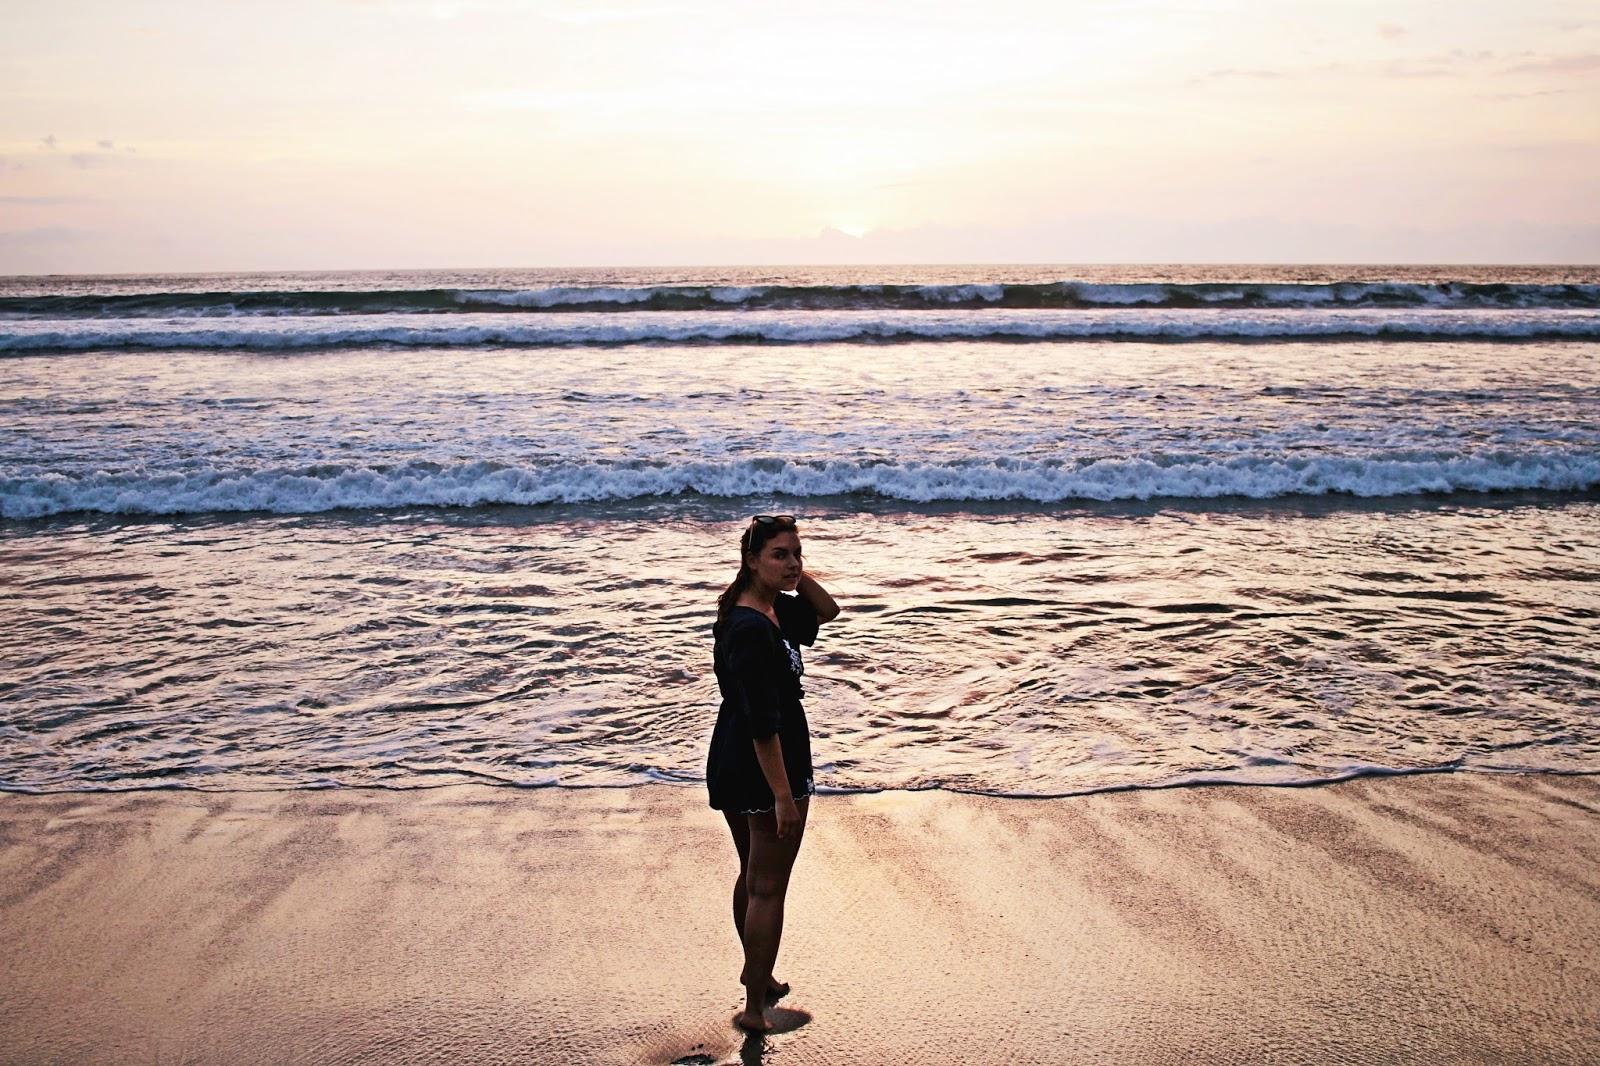 weltreise strand